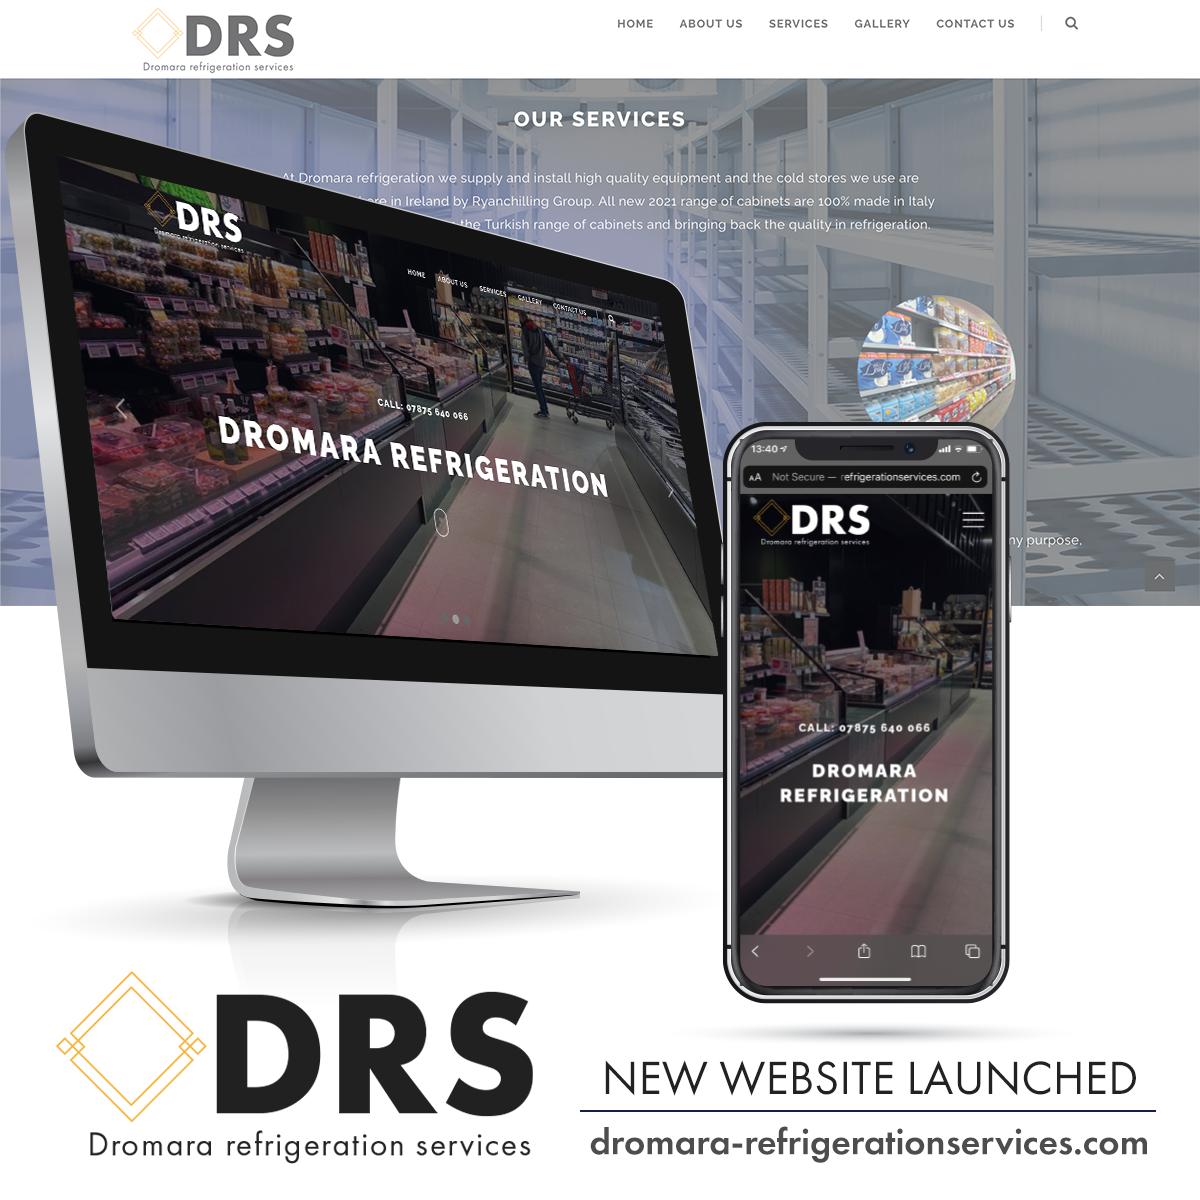 NI Designer web design DRS dromara-refrigerationservices.com